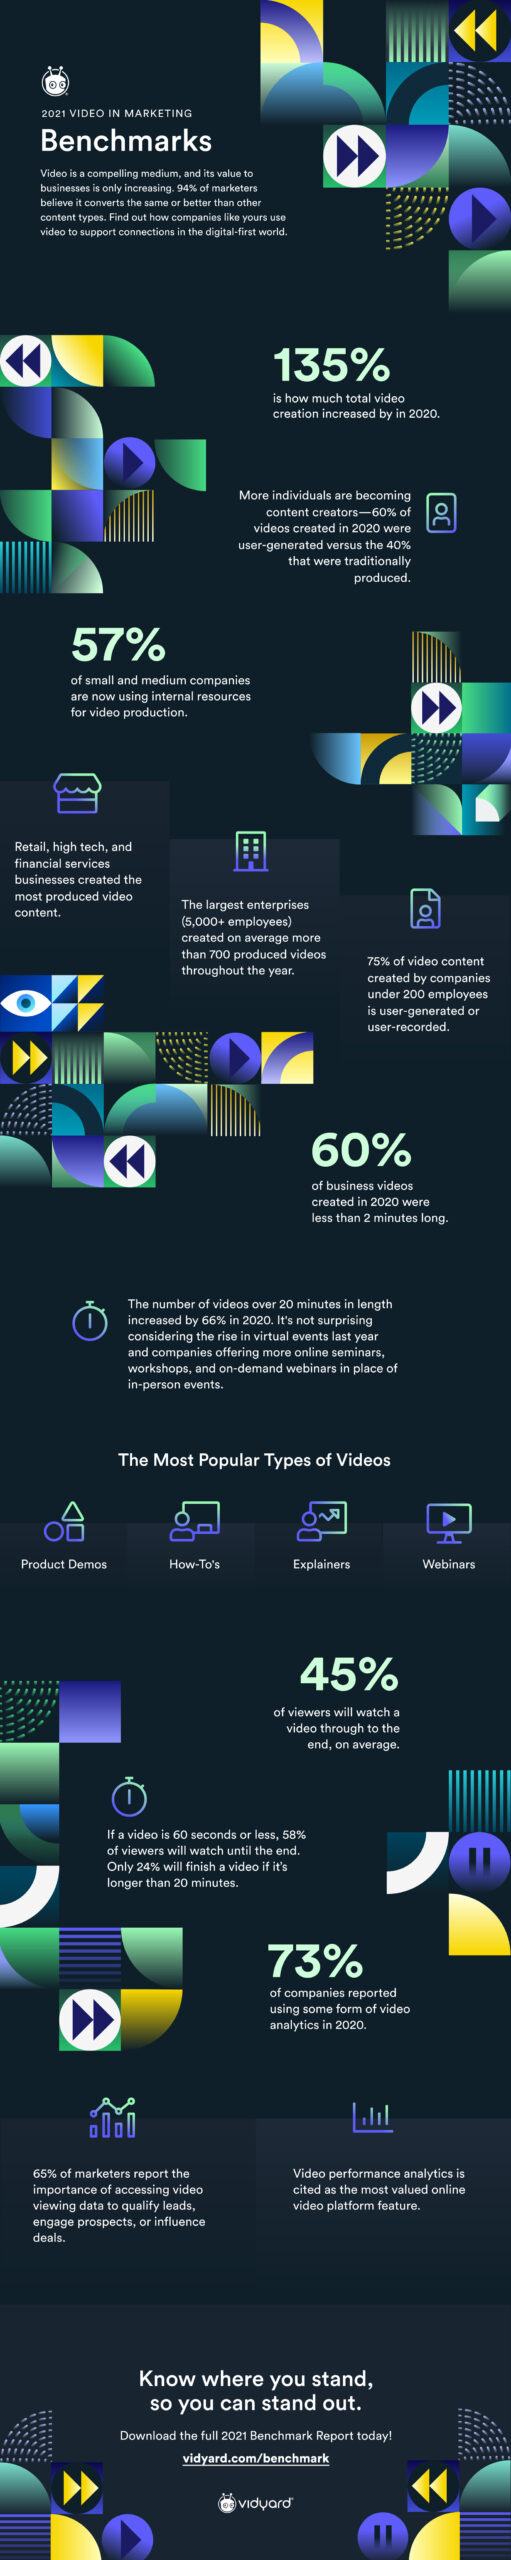 2021-Video-Marketing-Benchmarks-Vidyard-Infographic-scaled